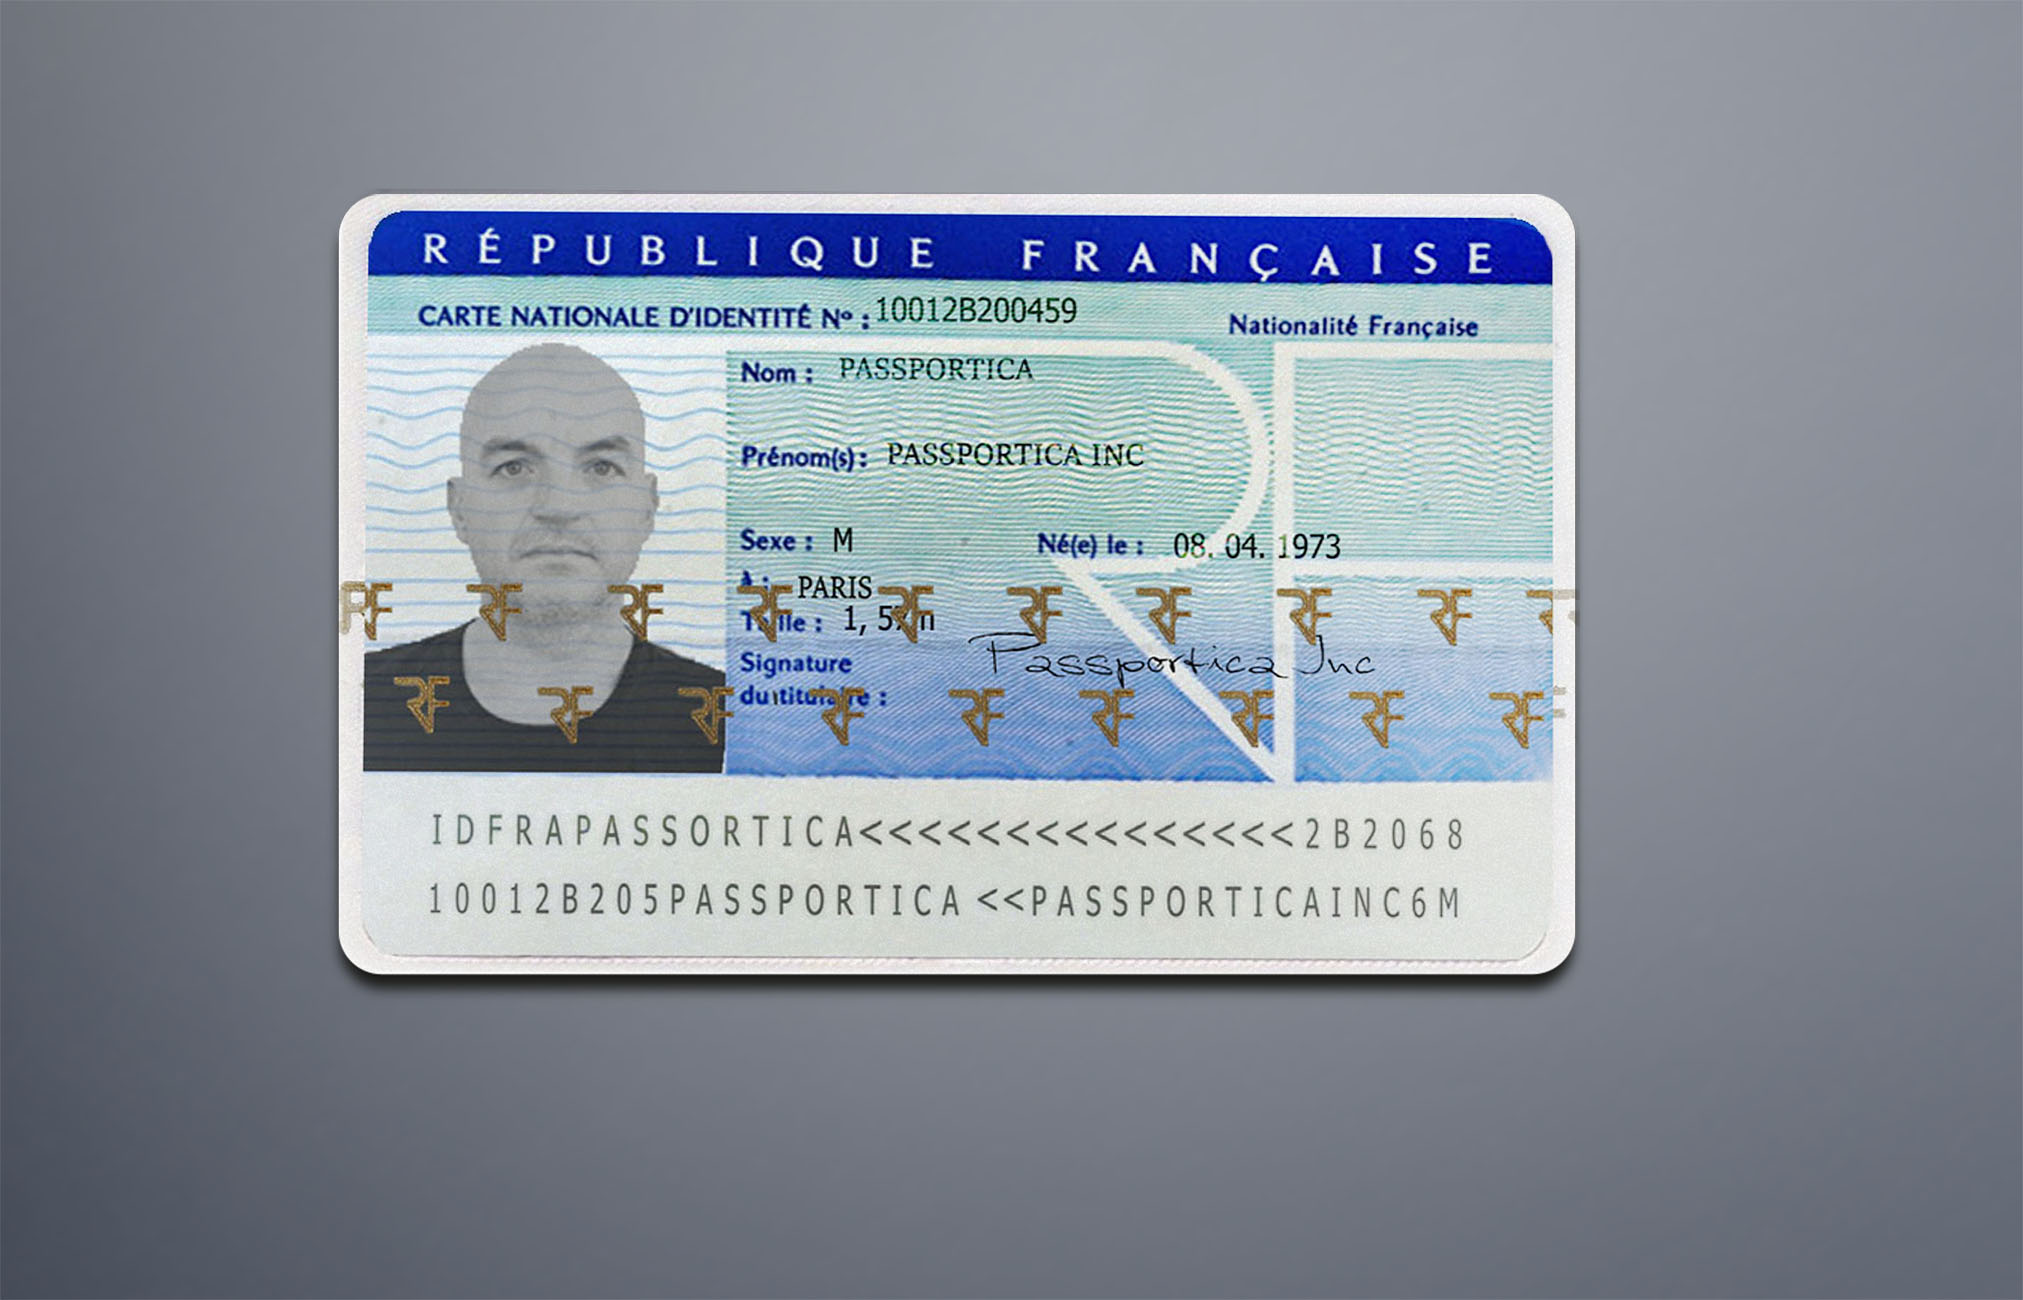 FRANCE ID CARD